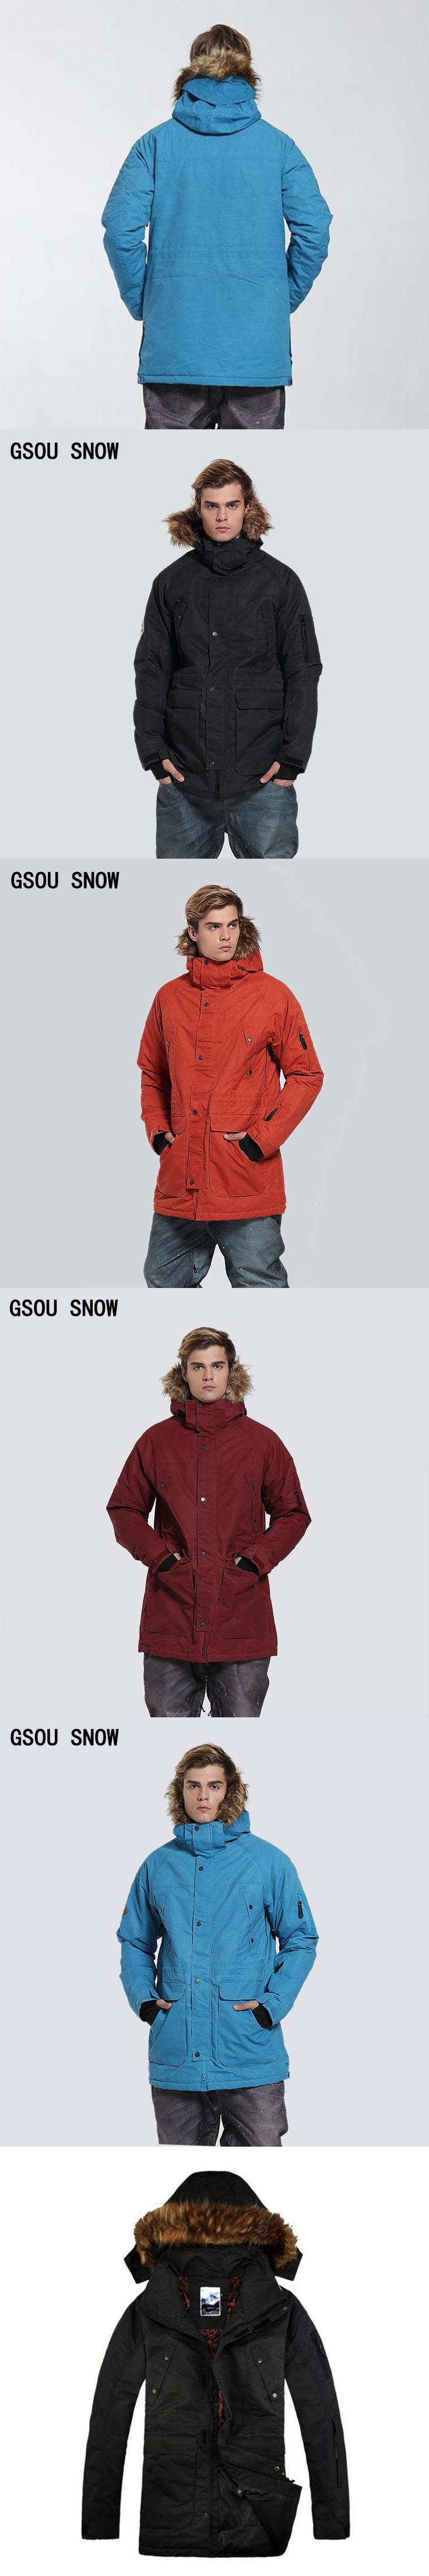 Gsou Snow winter ski snowboard jacket men insulated snow suit black warm waterproof ropa chaqueta esqui hombre veste ski homme